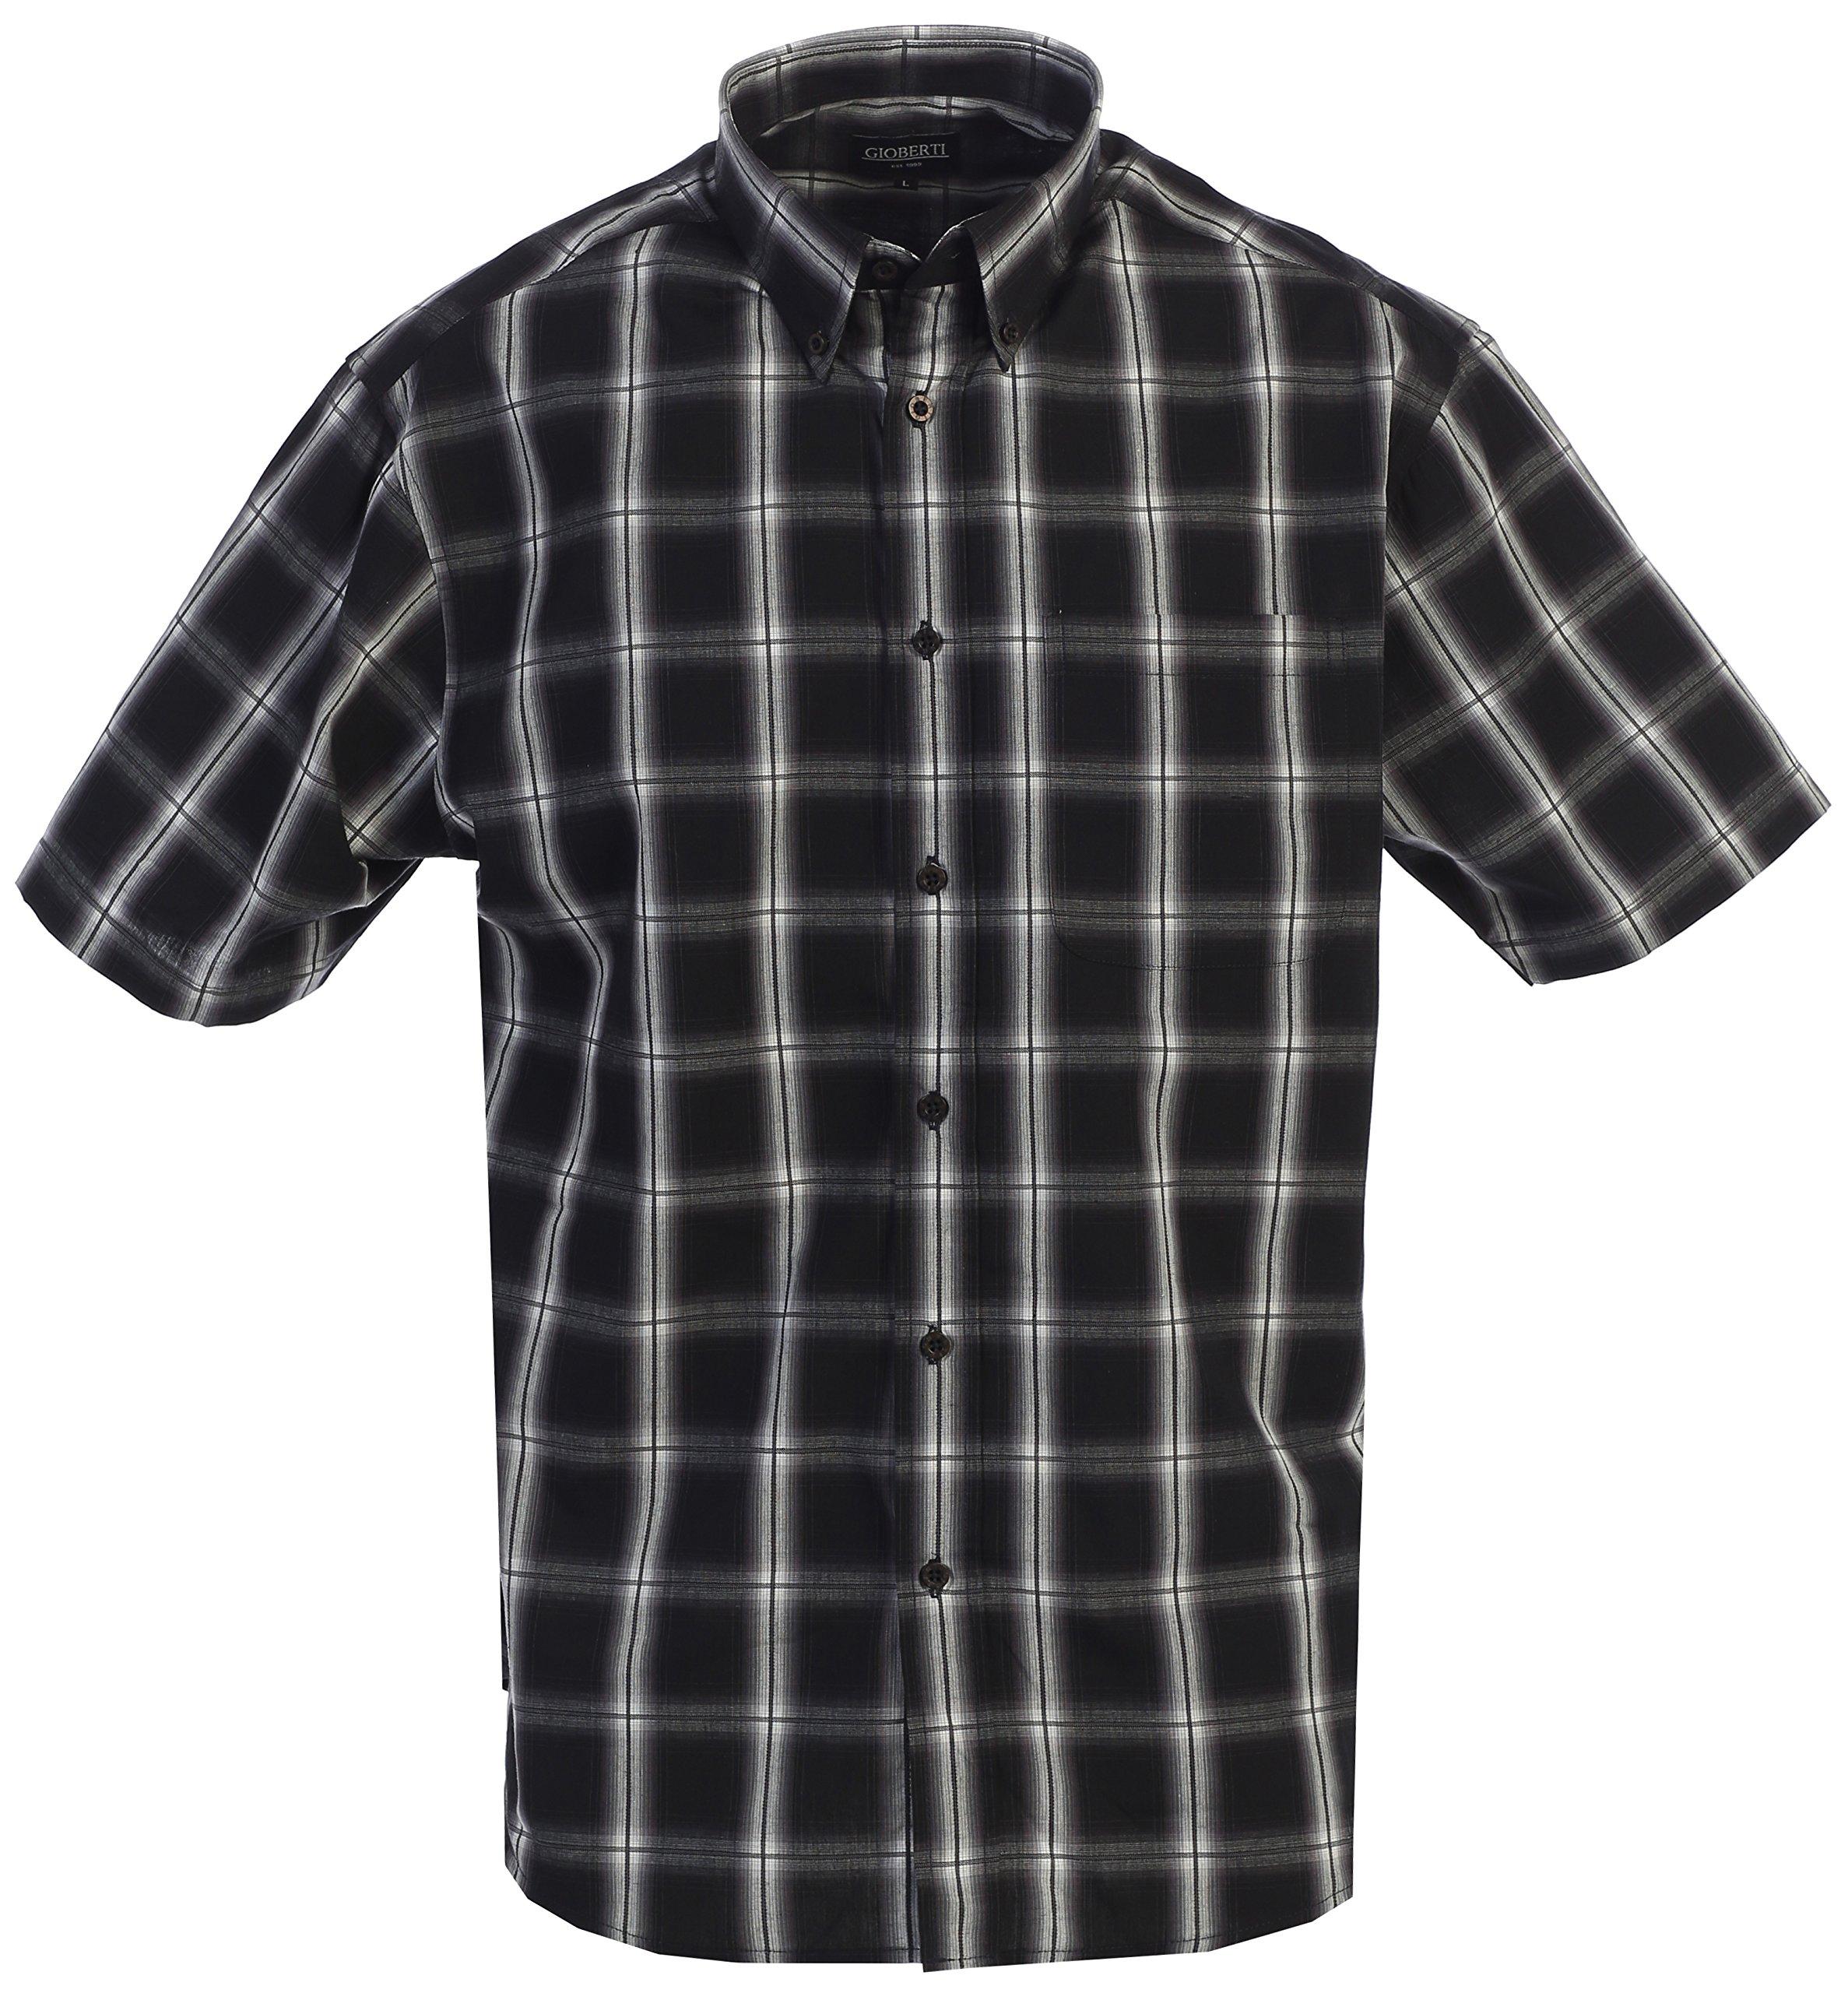 Gioberti Men's Plaid Short Sleeve Shirt, Black/Gray/White Highlight, X Large